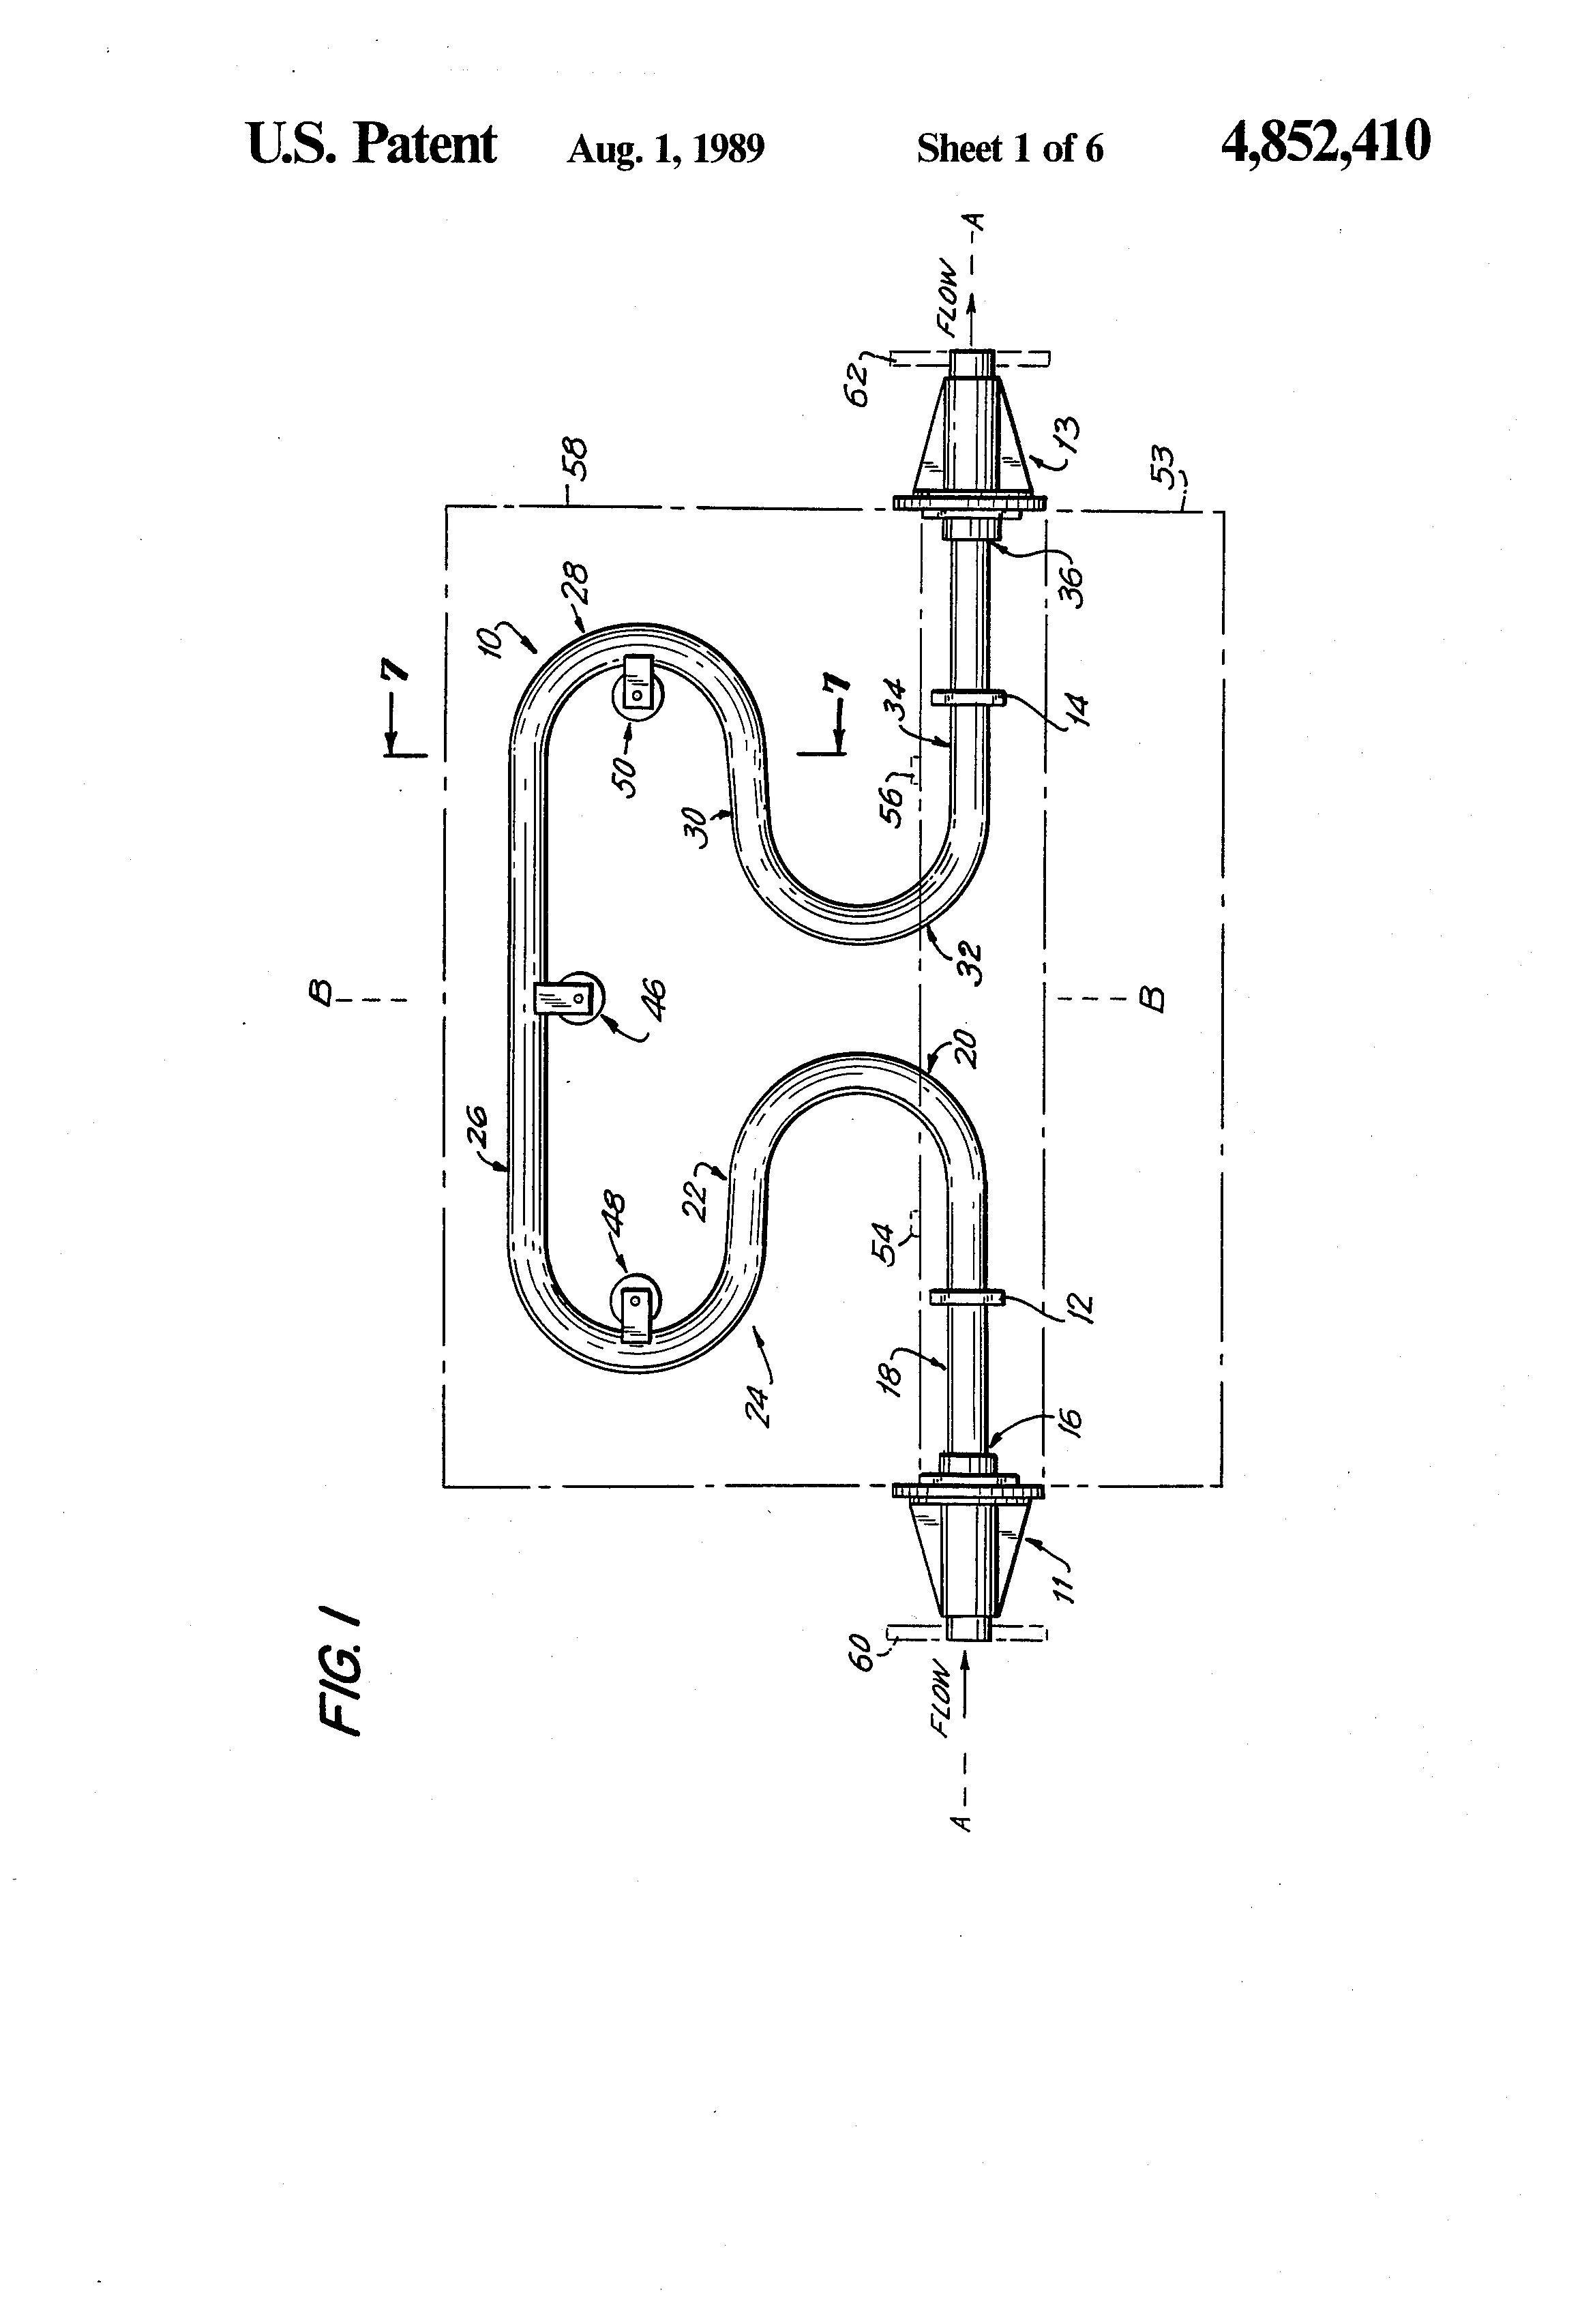 Yokogawa Coriolis Flow Meter Manual Water Wiring Diagrams How To Take An Oil And Density Measurement Youtube